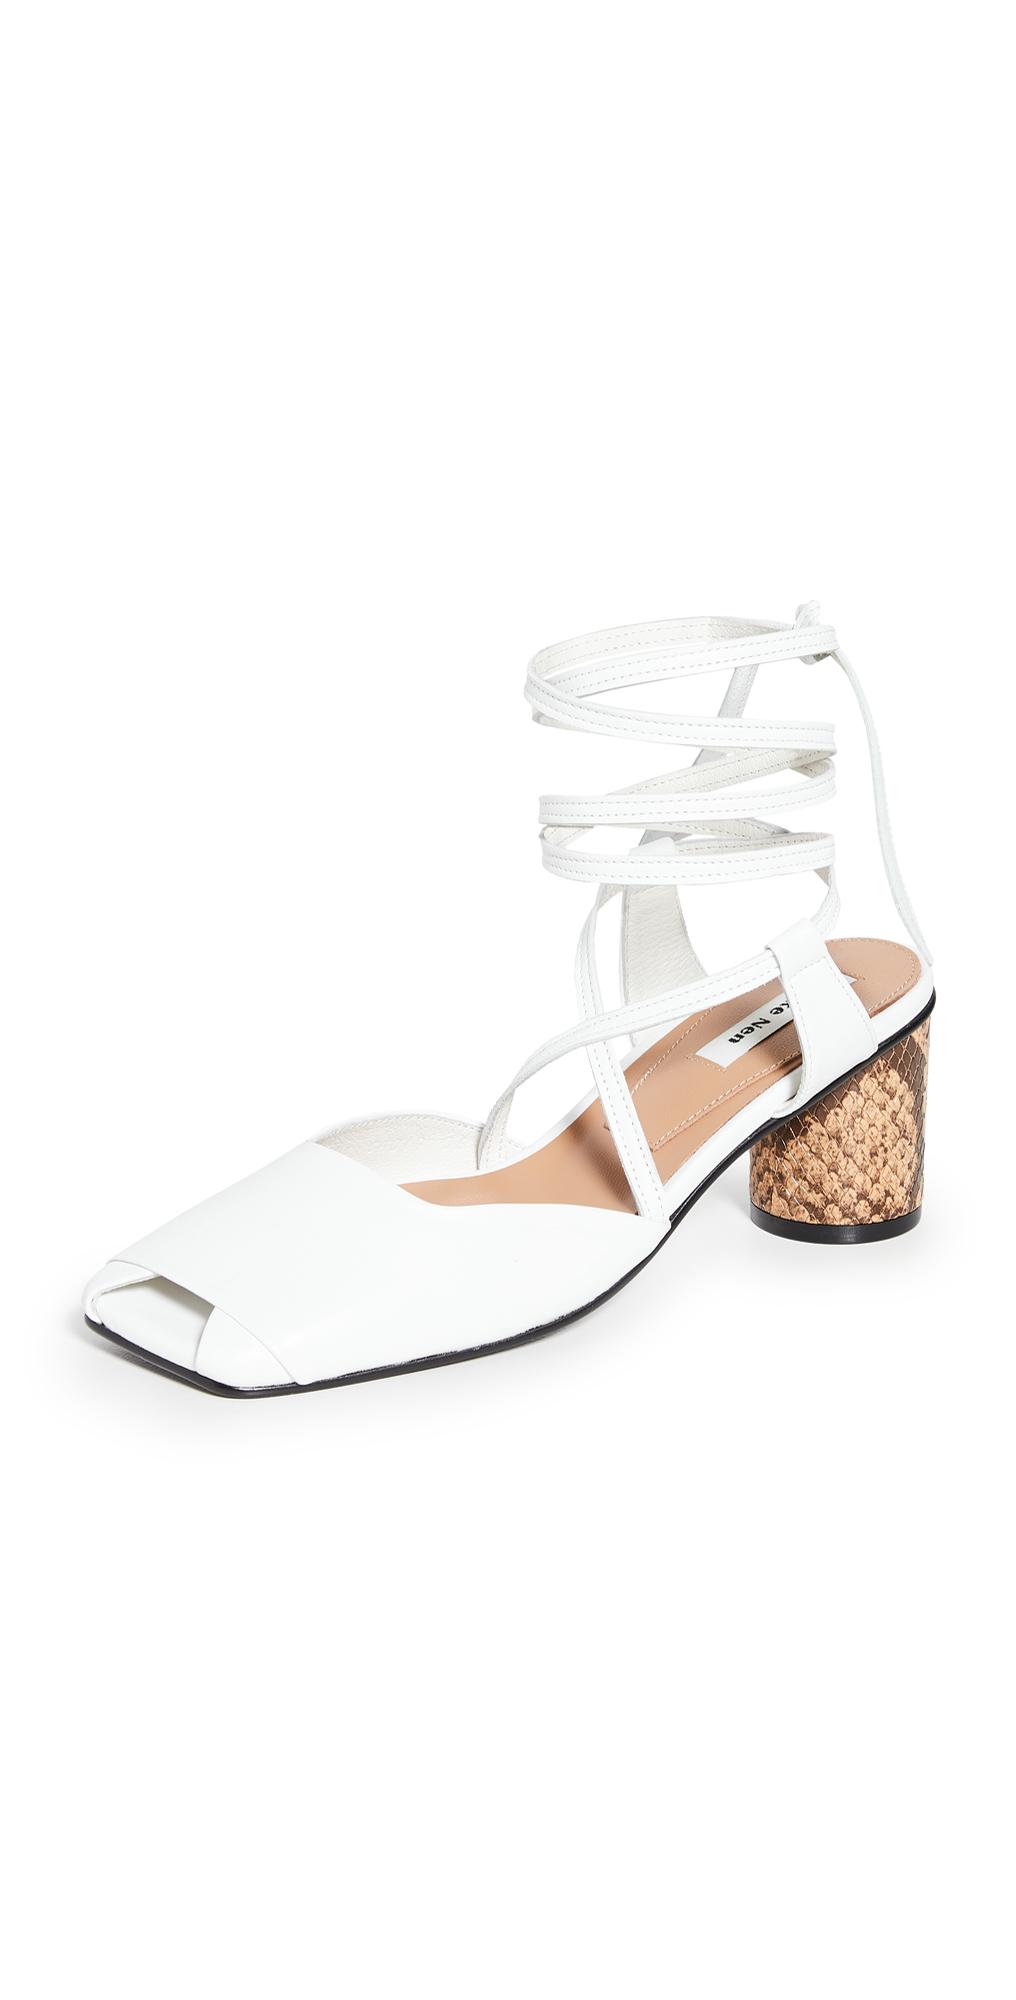 Reike Nen Open Toe Strap Sandals